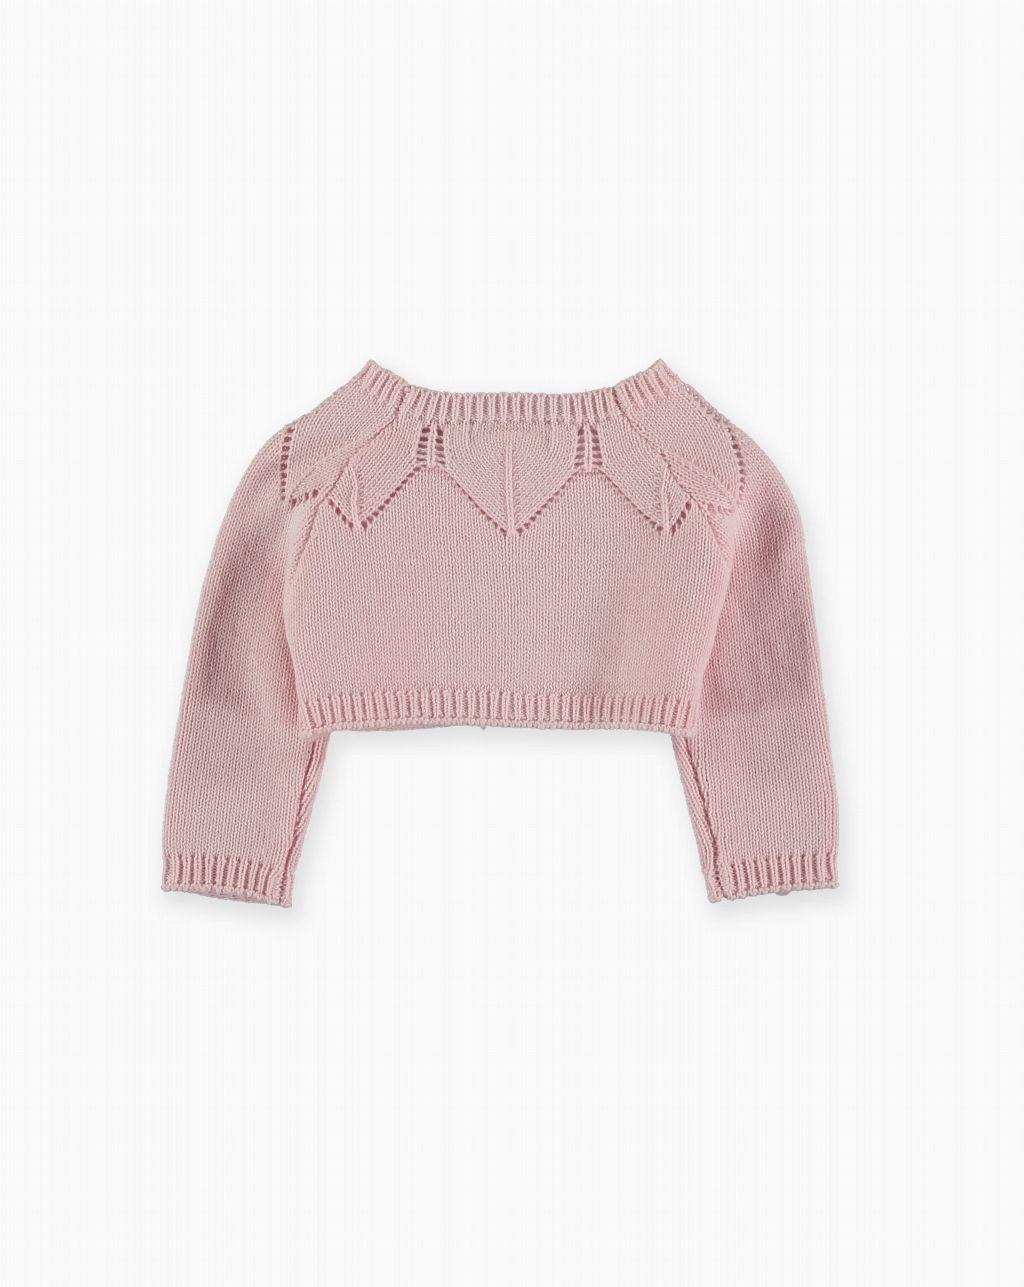 Pan con Chocolate: Chaqueta tricot Velez